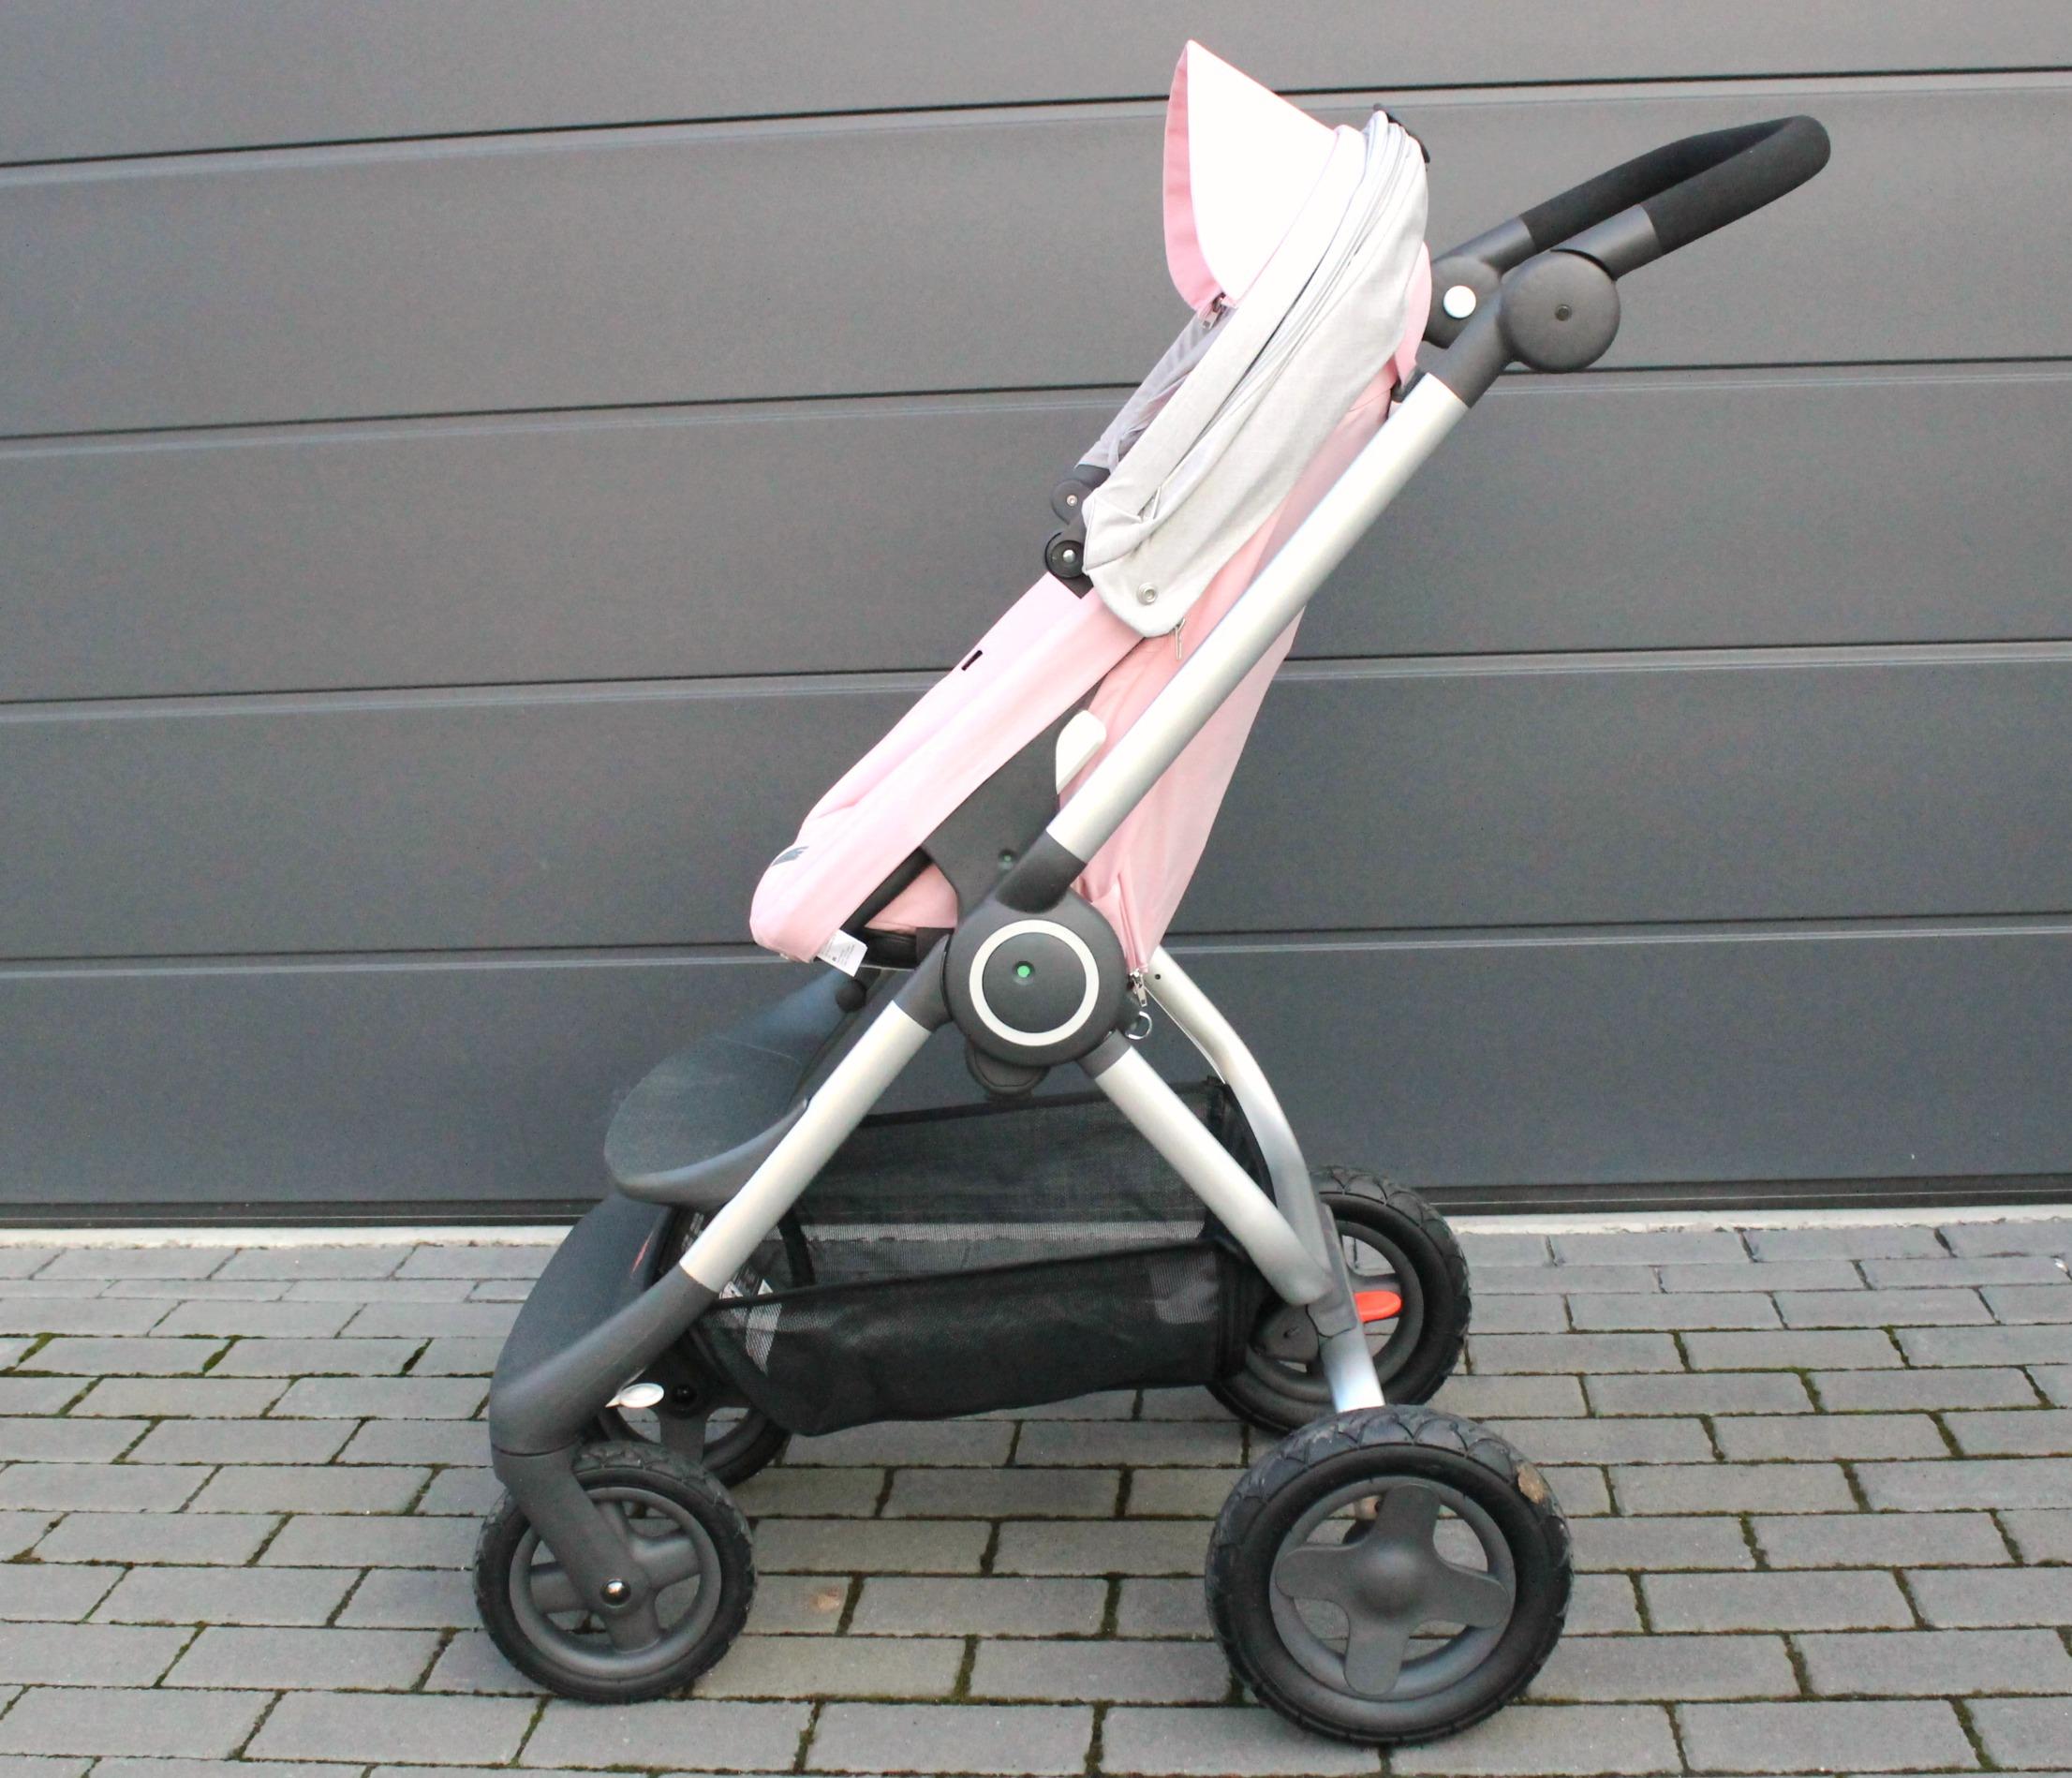 stokkeonthego - der Stokke Scoot im Test // Review - LifestyleMommy